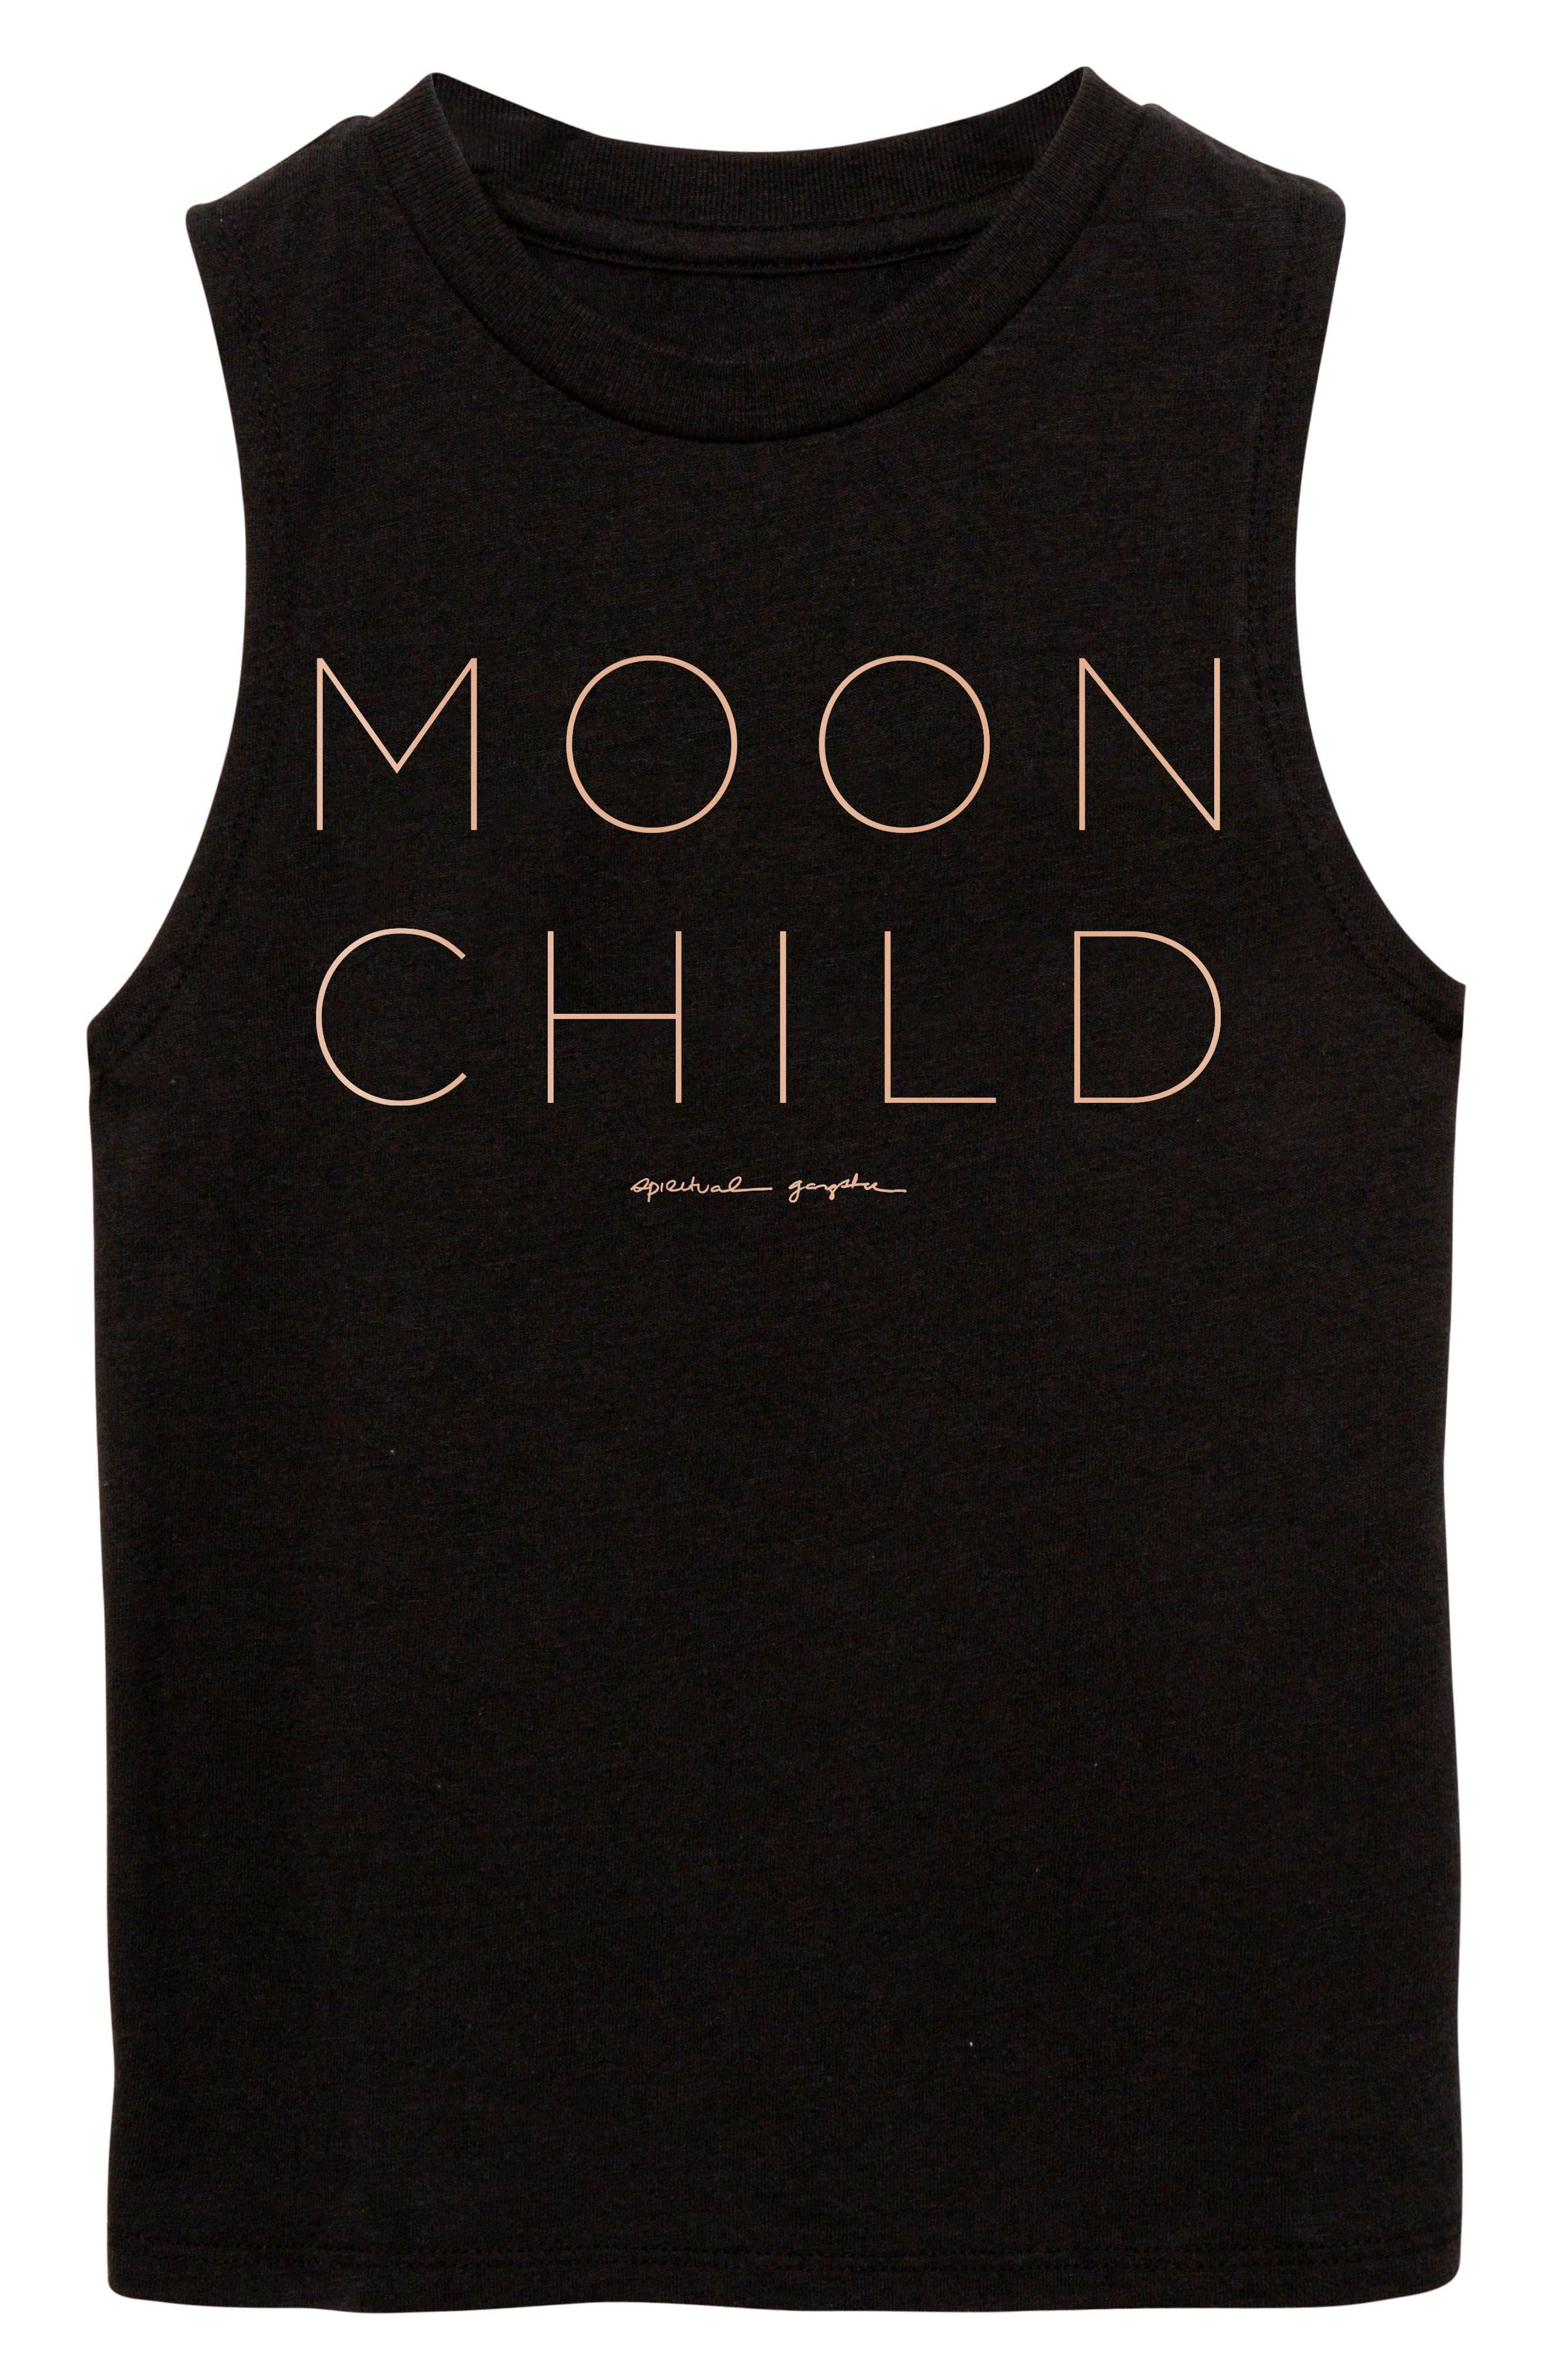 Moon Child Graphic Tank,                             Main thumbnail 1, color,                             Vintage Black